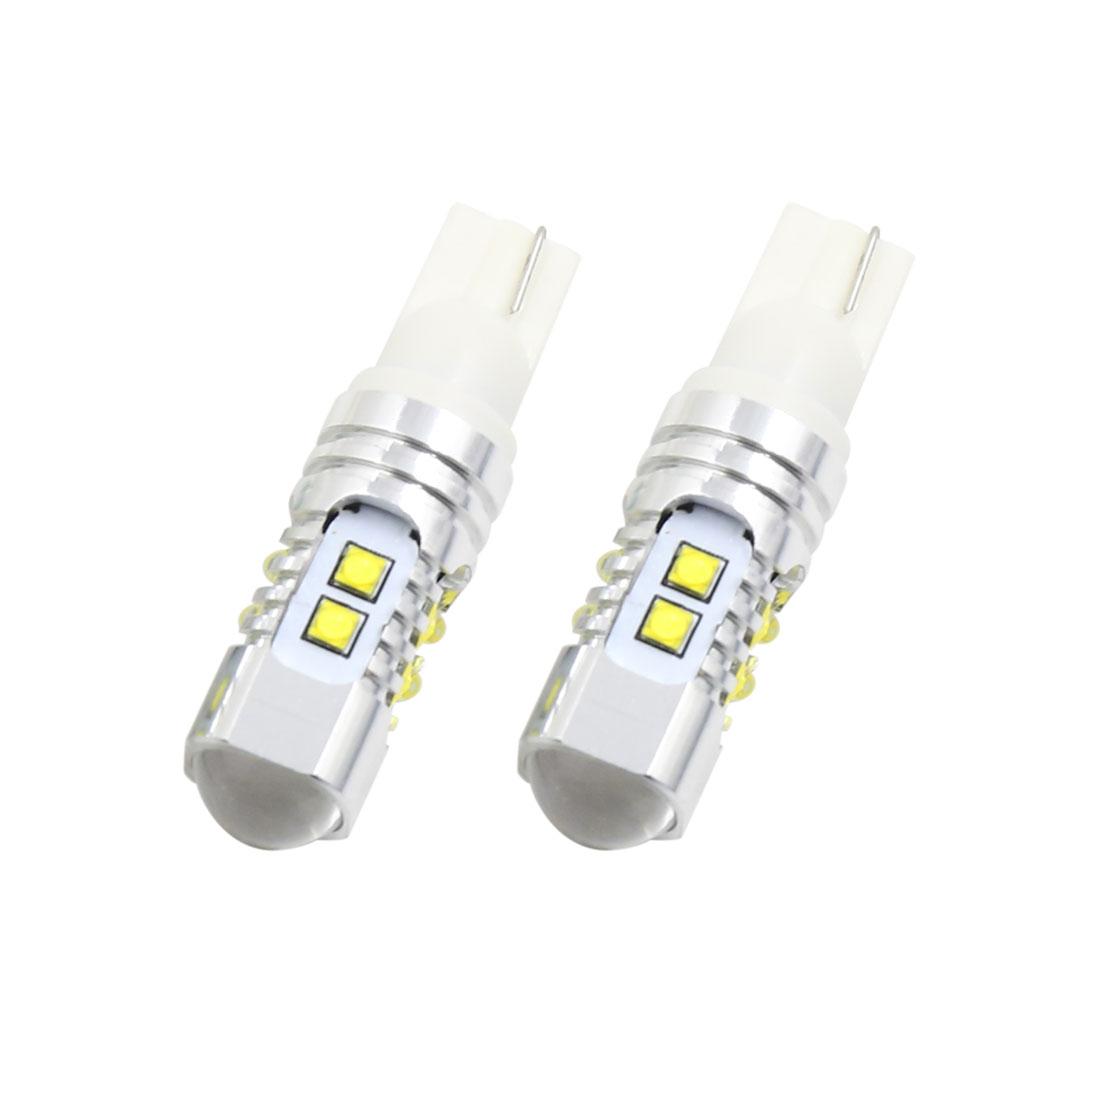 2pcs 50W 12-24V T10 6500K High Power Car White LED Turn Signal Brake Light Bulb